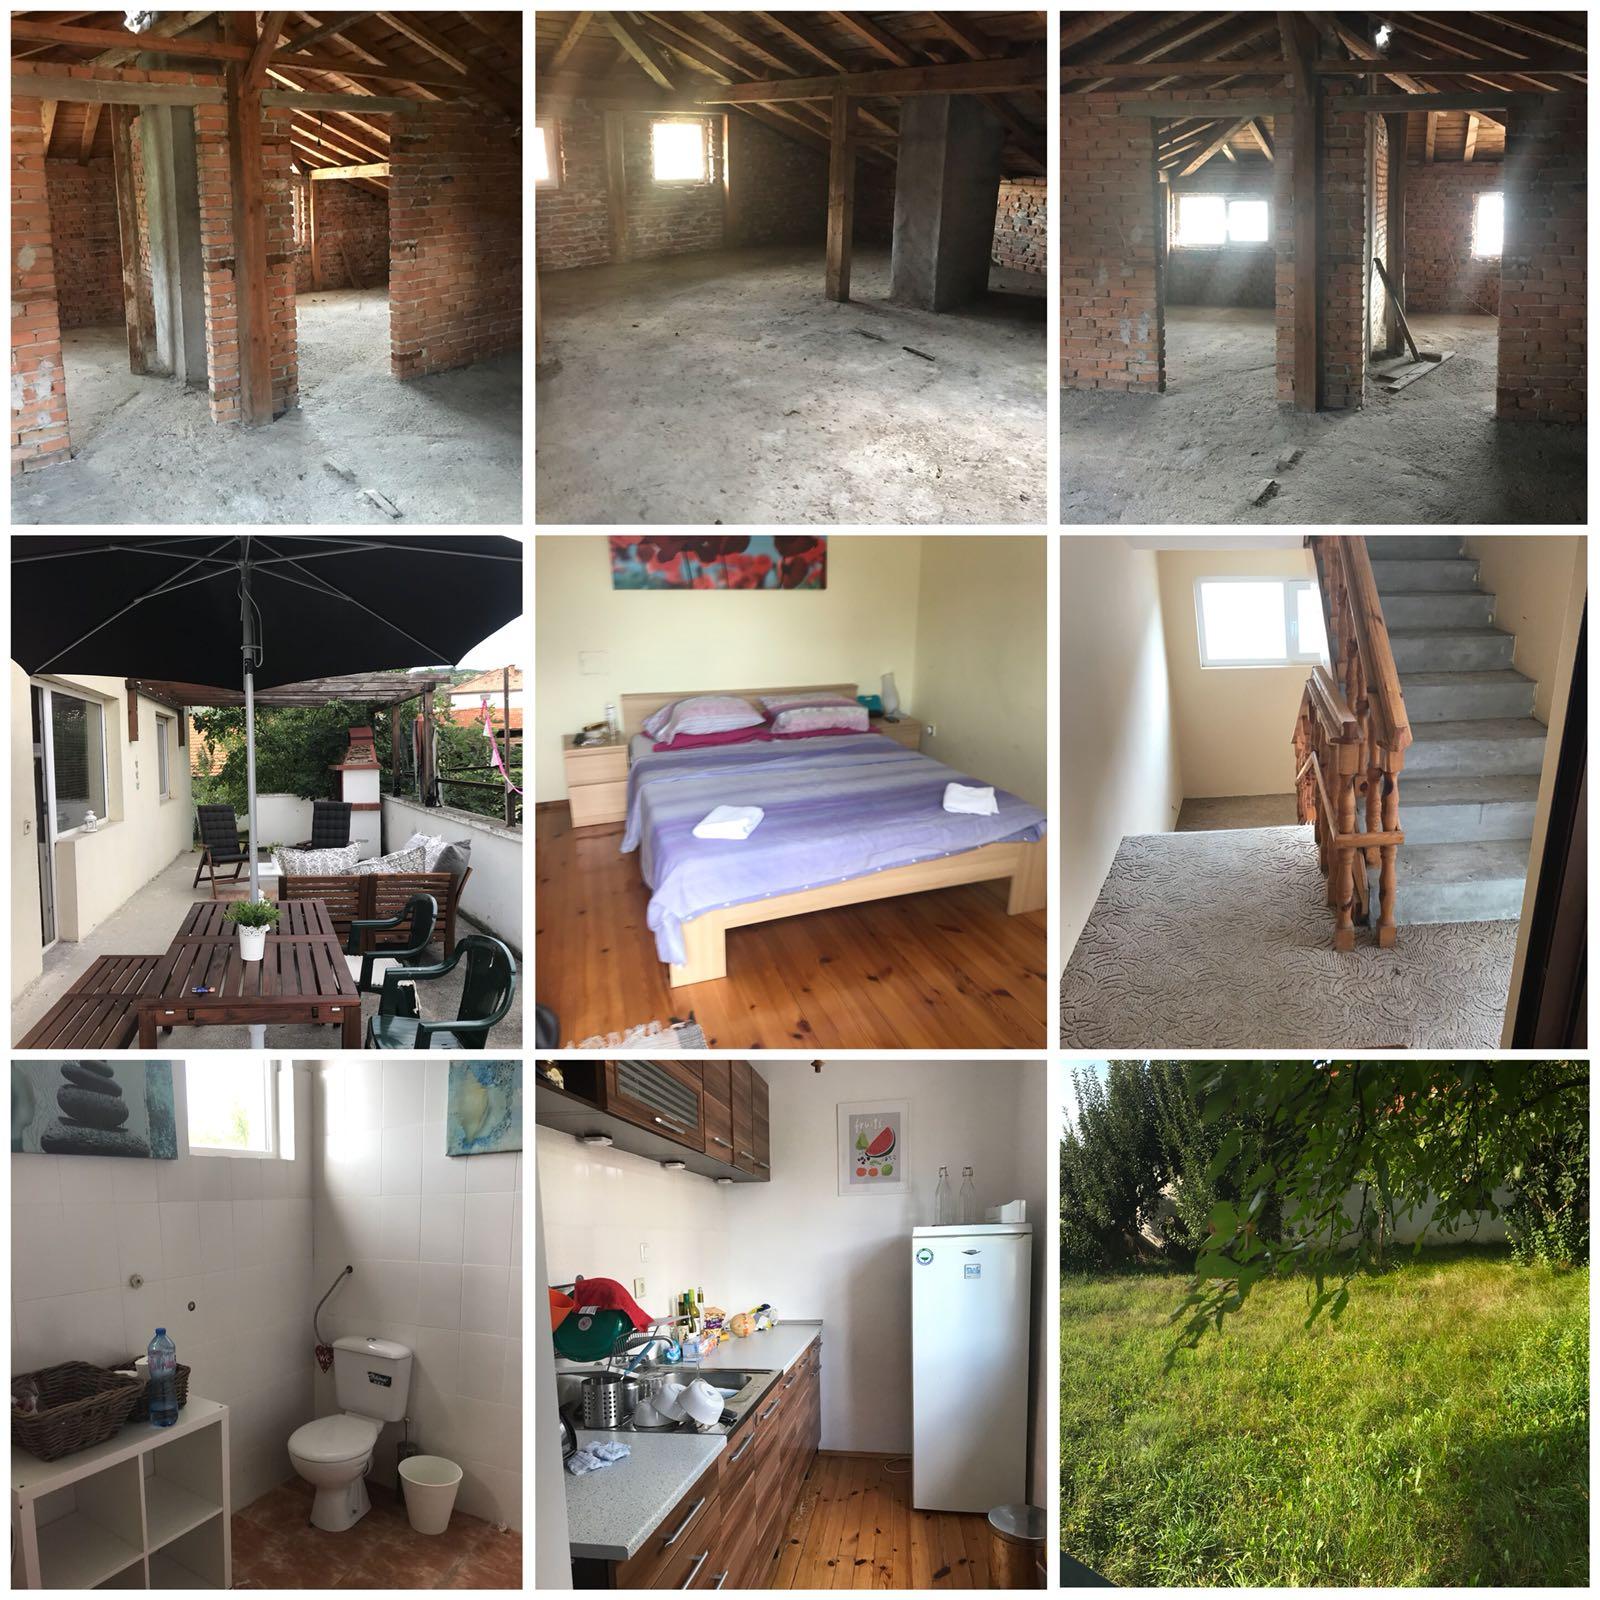 1548974446-sell-property-c9d0f779-d5c6-410f-866f-b5126075f7c5.jpeg